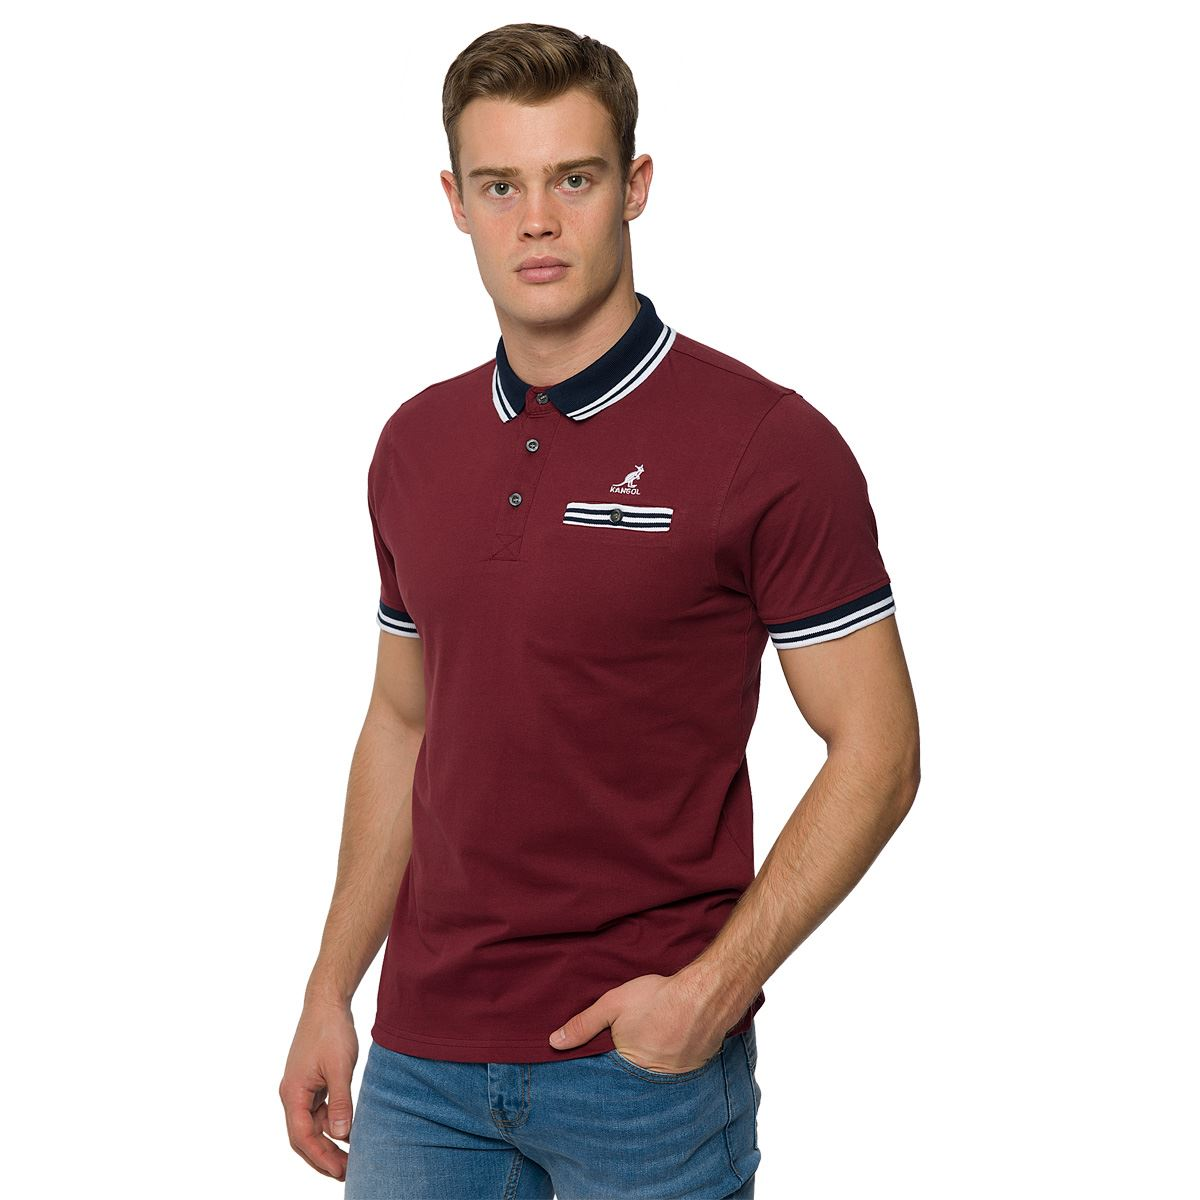 Kangol mens plain classic polo shirt collared tee cotton for Xxl mens polo shirts